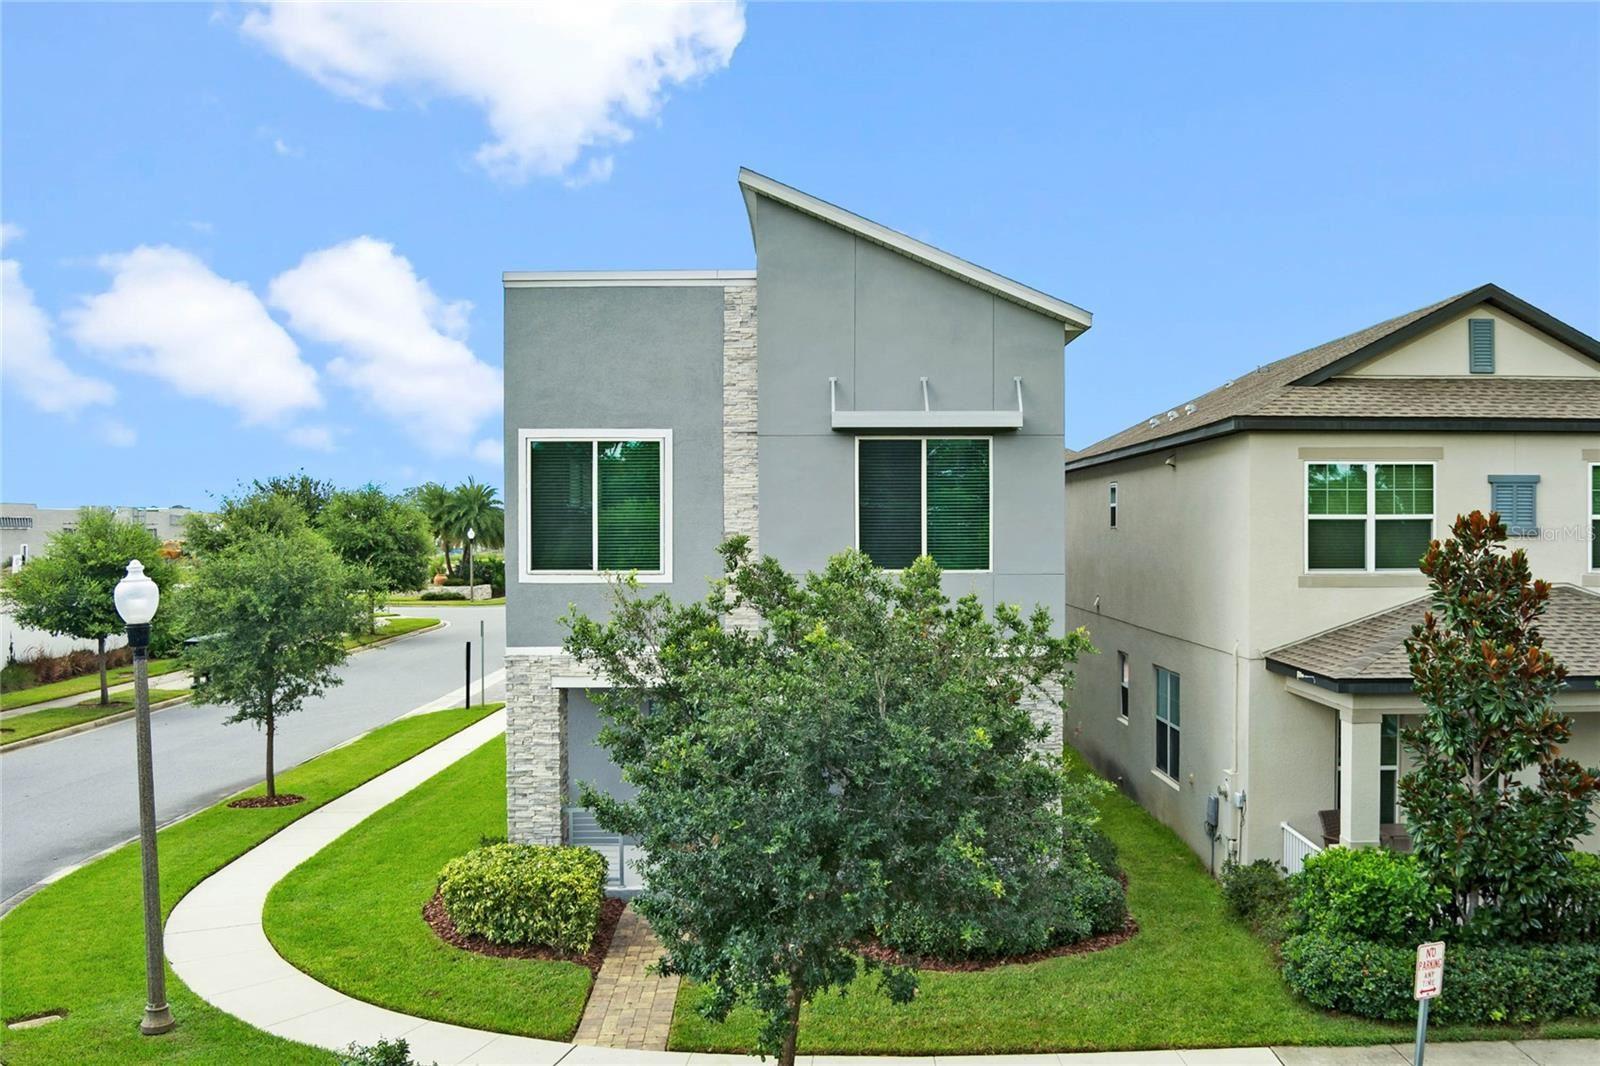 9107 GRAND ISLAND WAY, Winter Garden, FL 34787 - #: O5962071